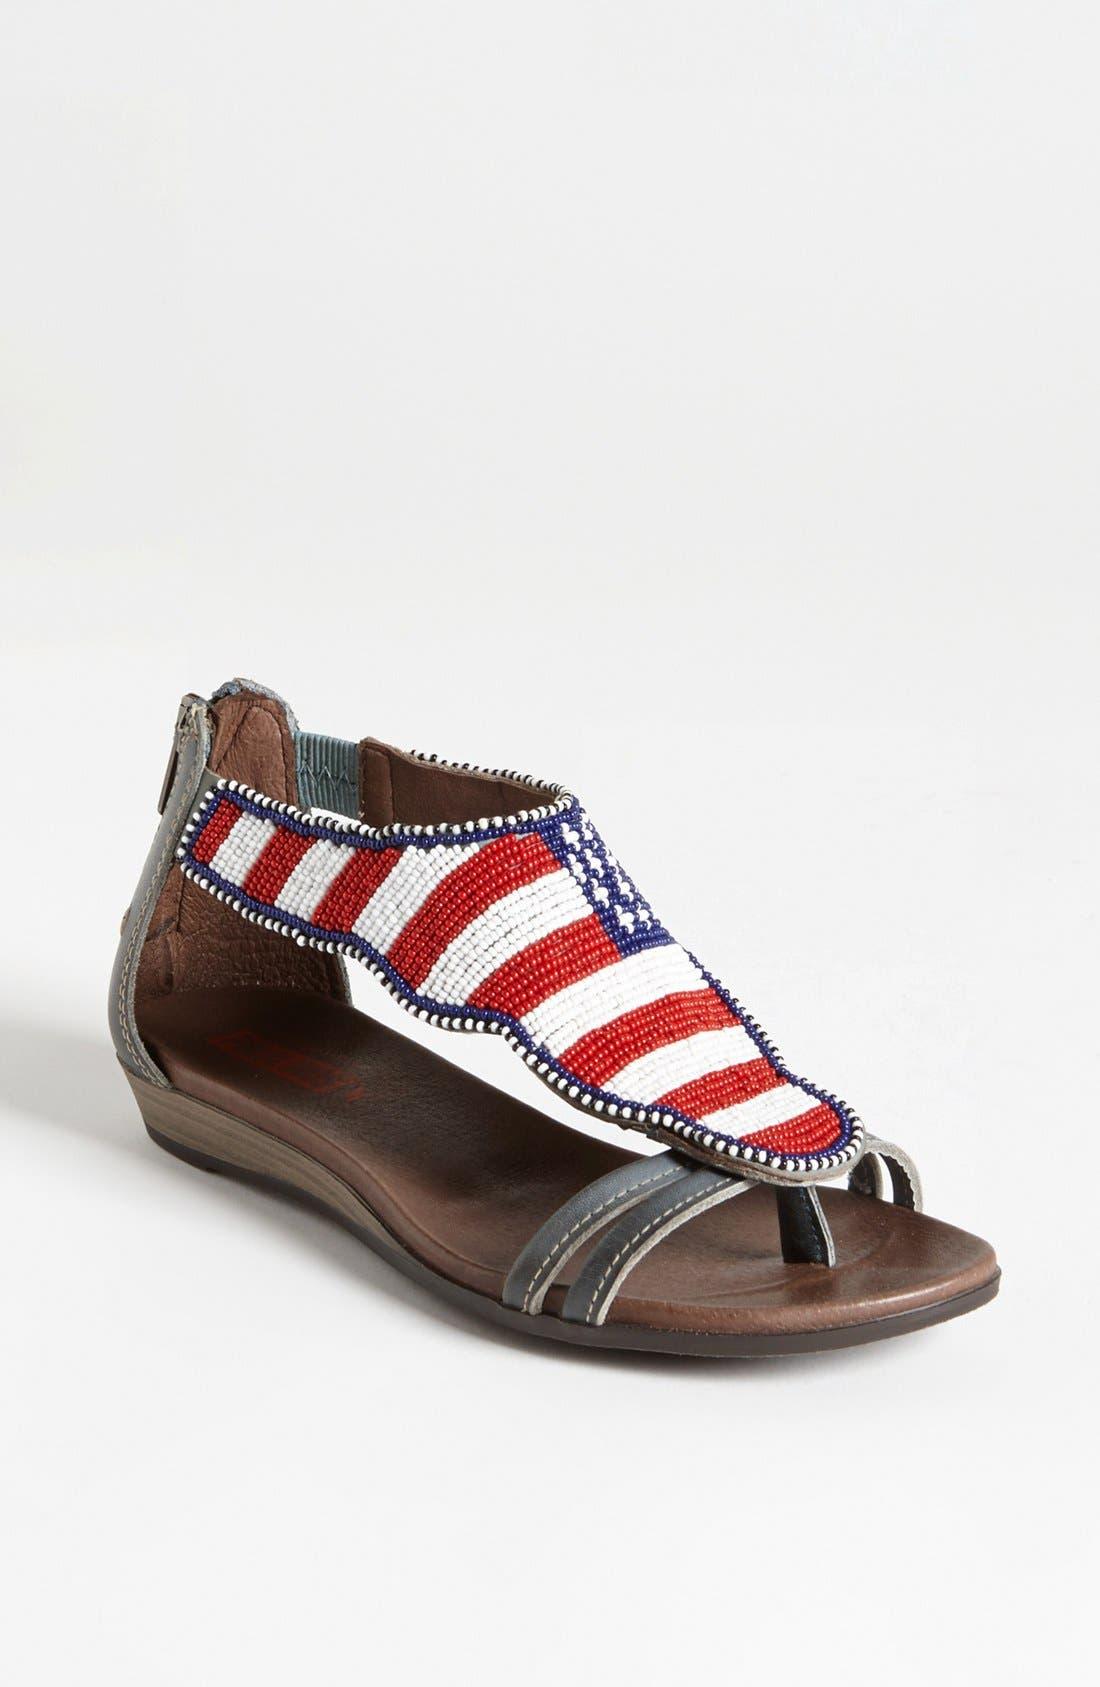 Alternate Image 1 Selected - PIKOLINOS 'Alcudia Maasai - USA' Sandal